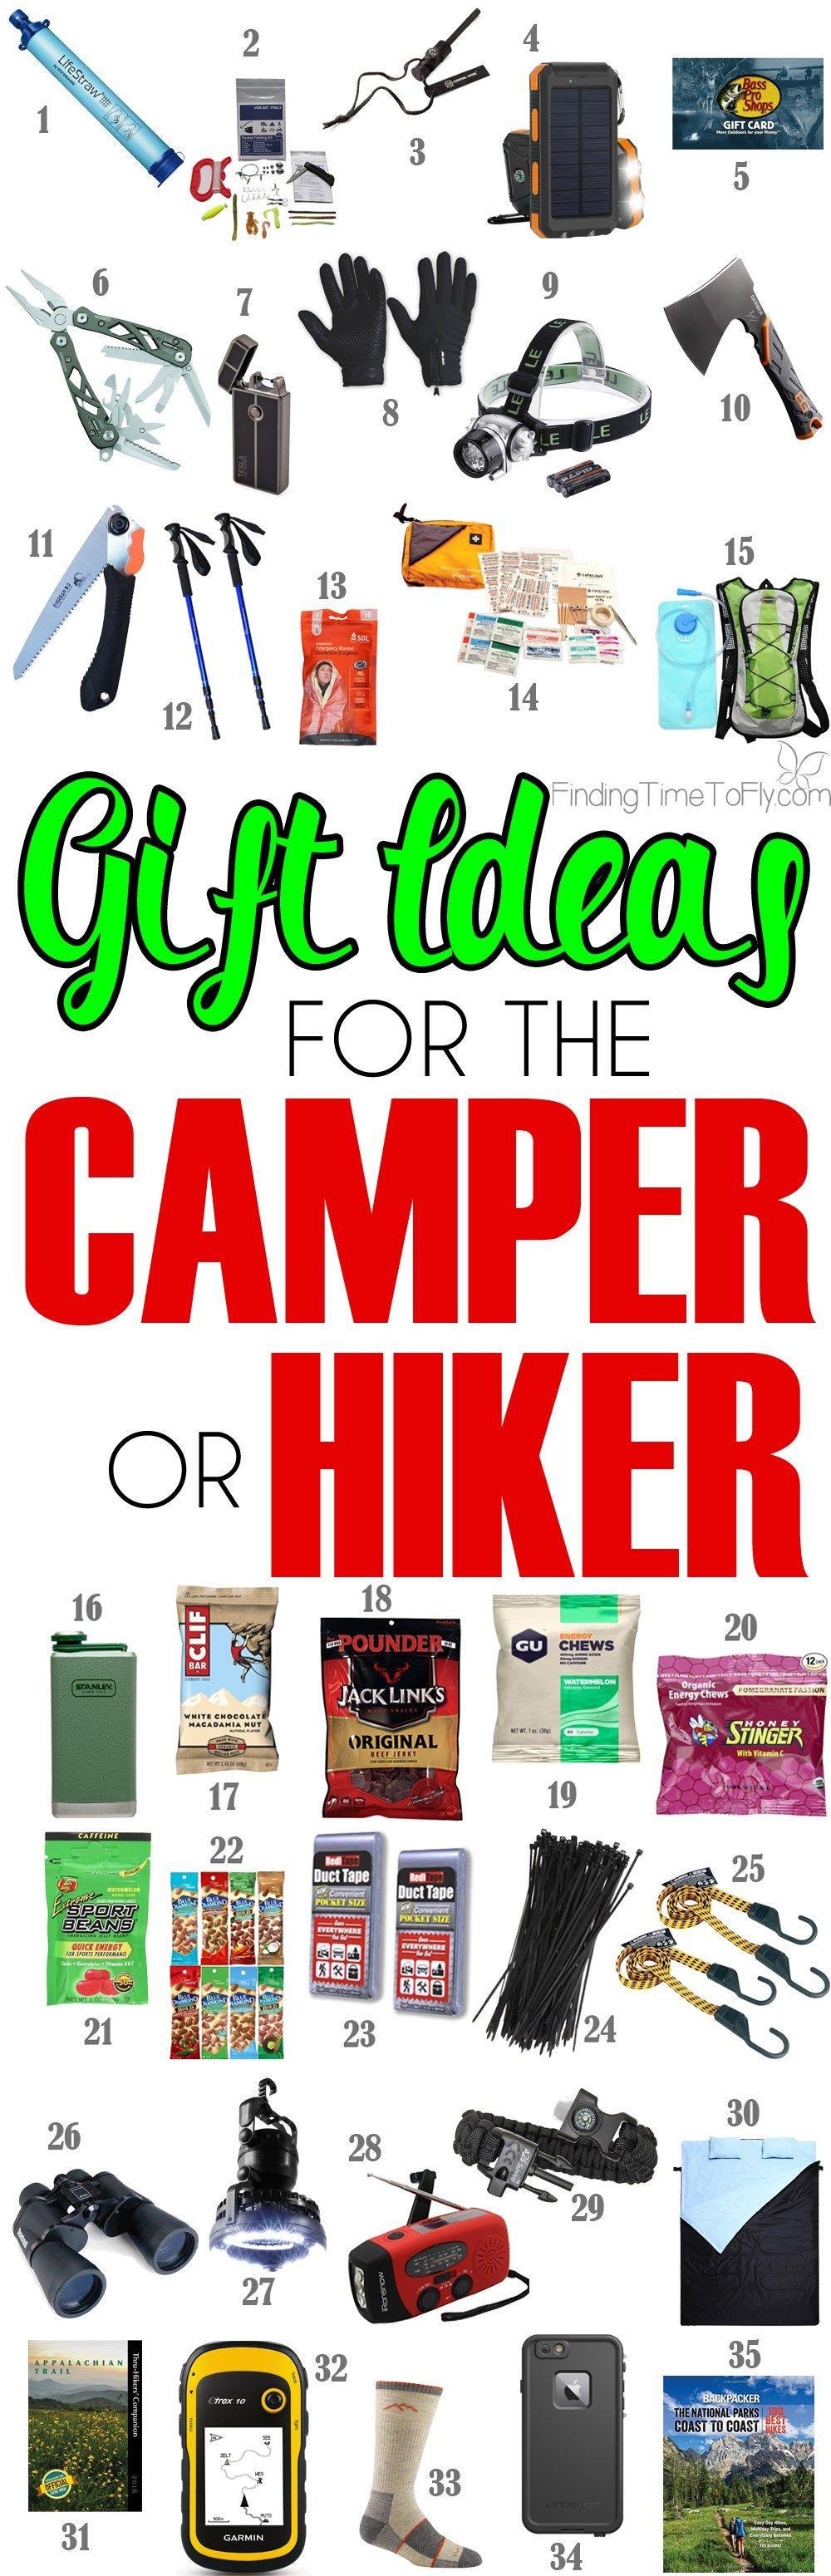 35 gift ideas for the outdoorsman camper hiker hiker